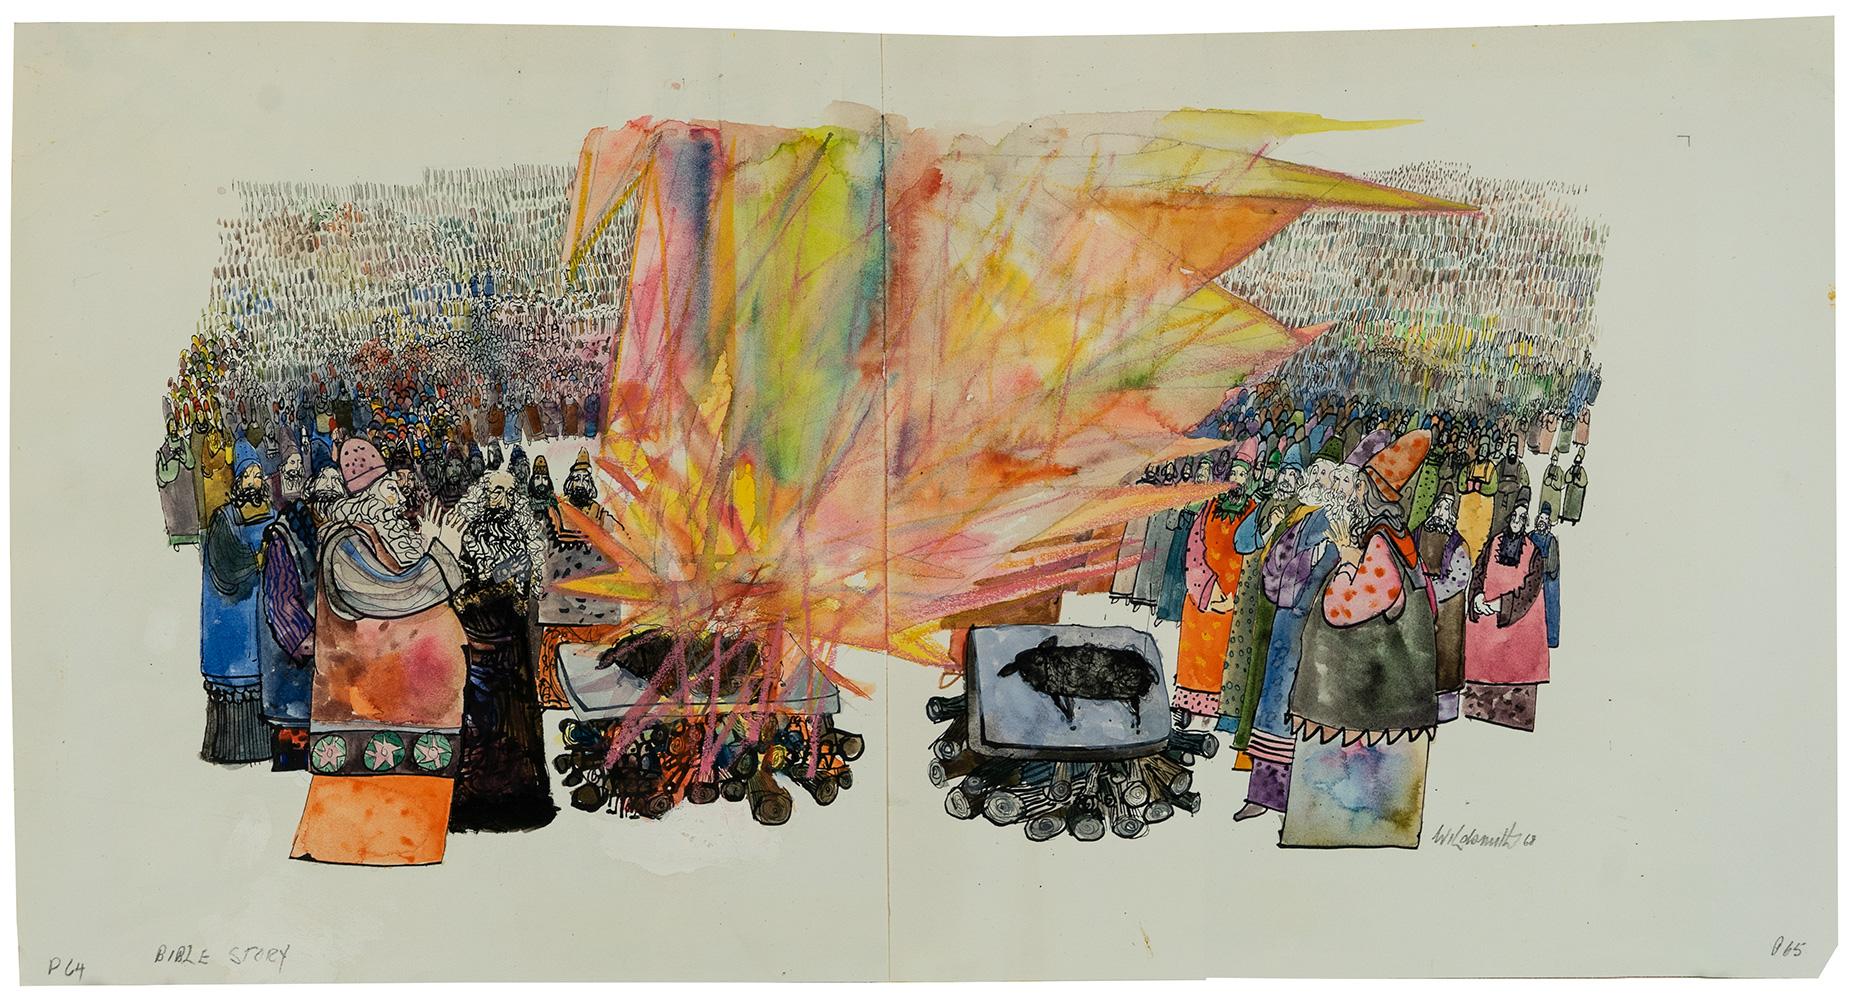 The-Bible-Story-P64-original-illustration-Brian-Wildsmith-1968.jpg